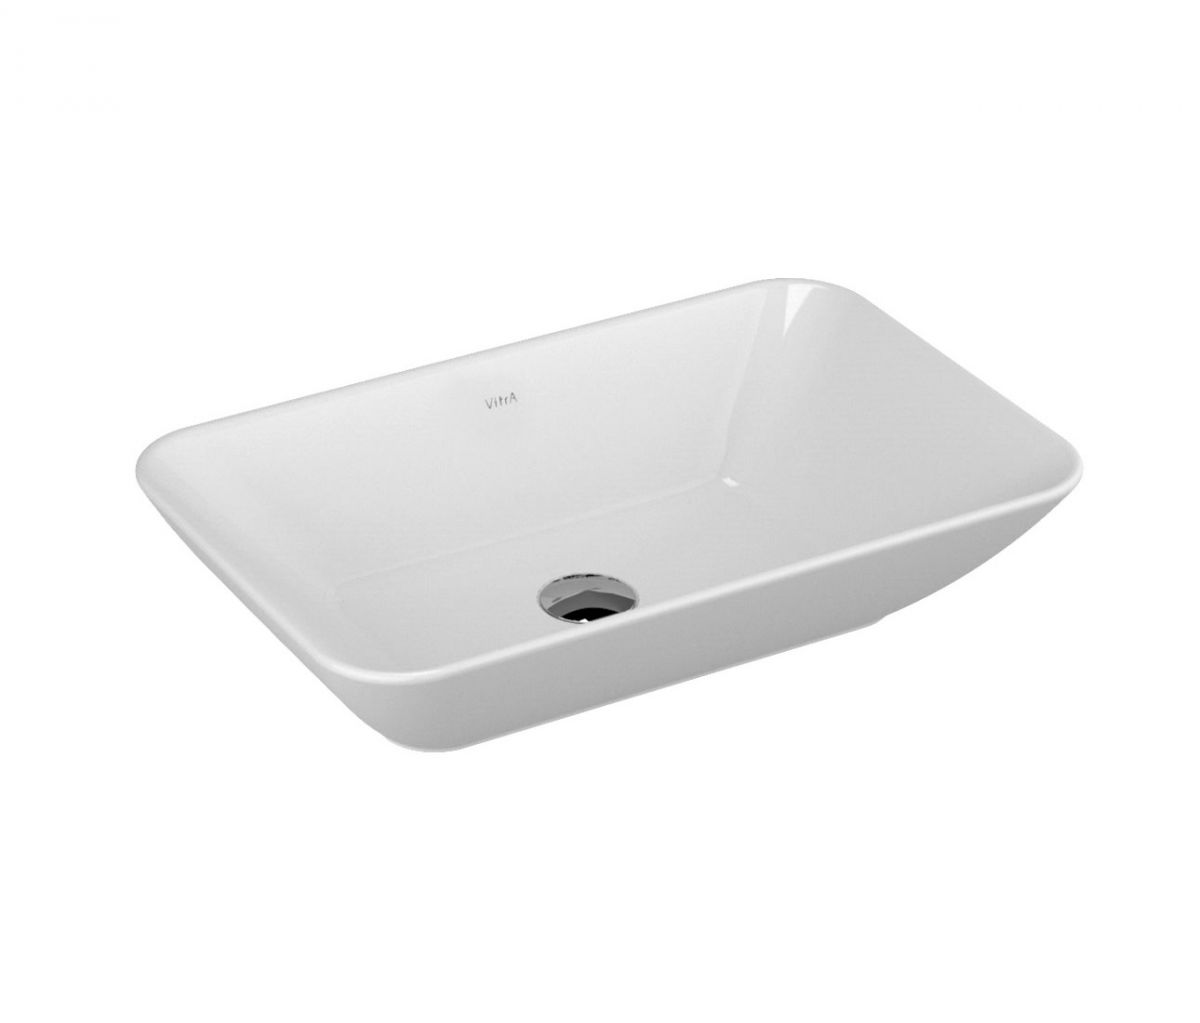 Bathroom Basin Countertop : ... basin vitrad163 4425 home bathrooms basins and sinks countertop basins